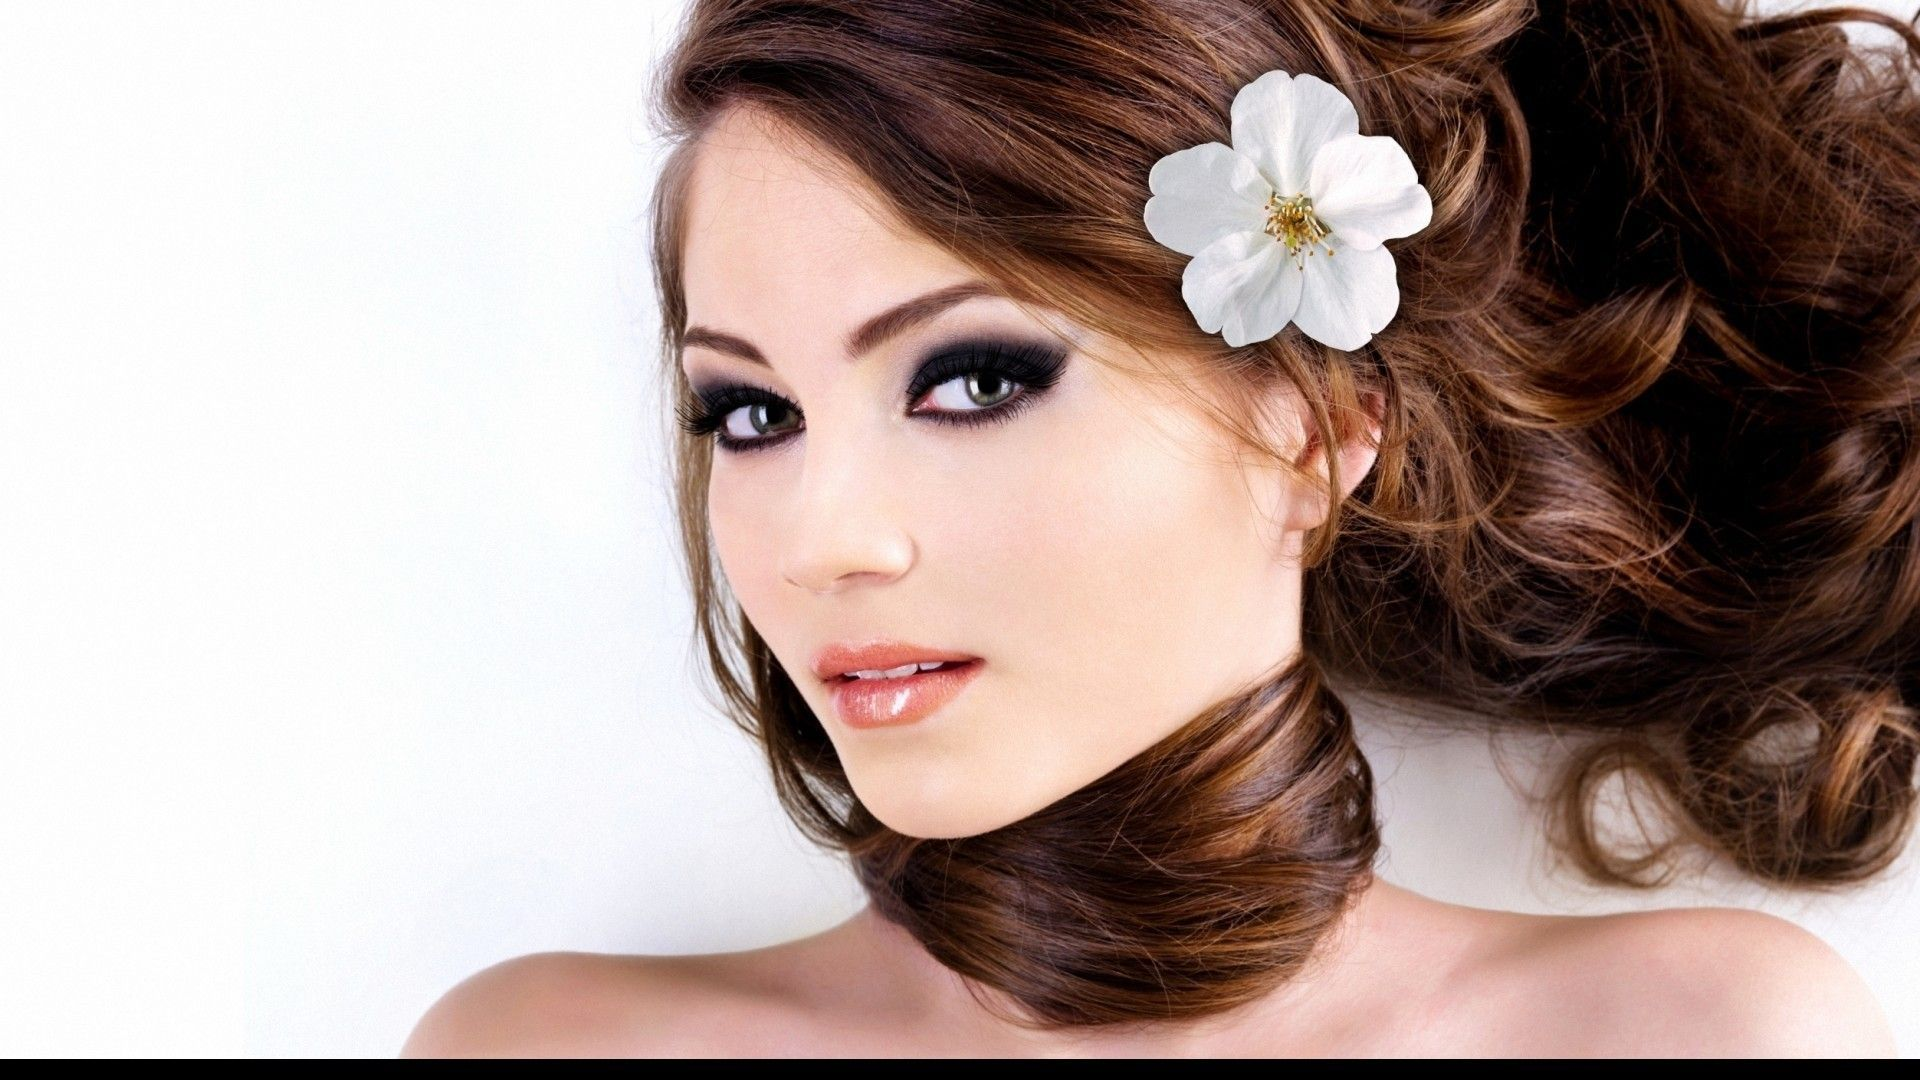 30 beautiful girls picture beautiful girls wallpapers anise